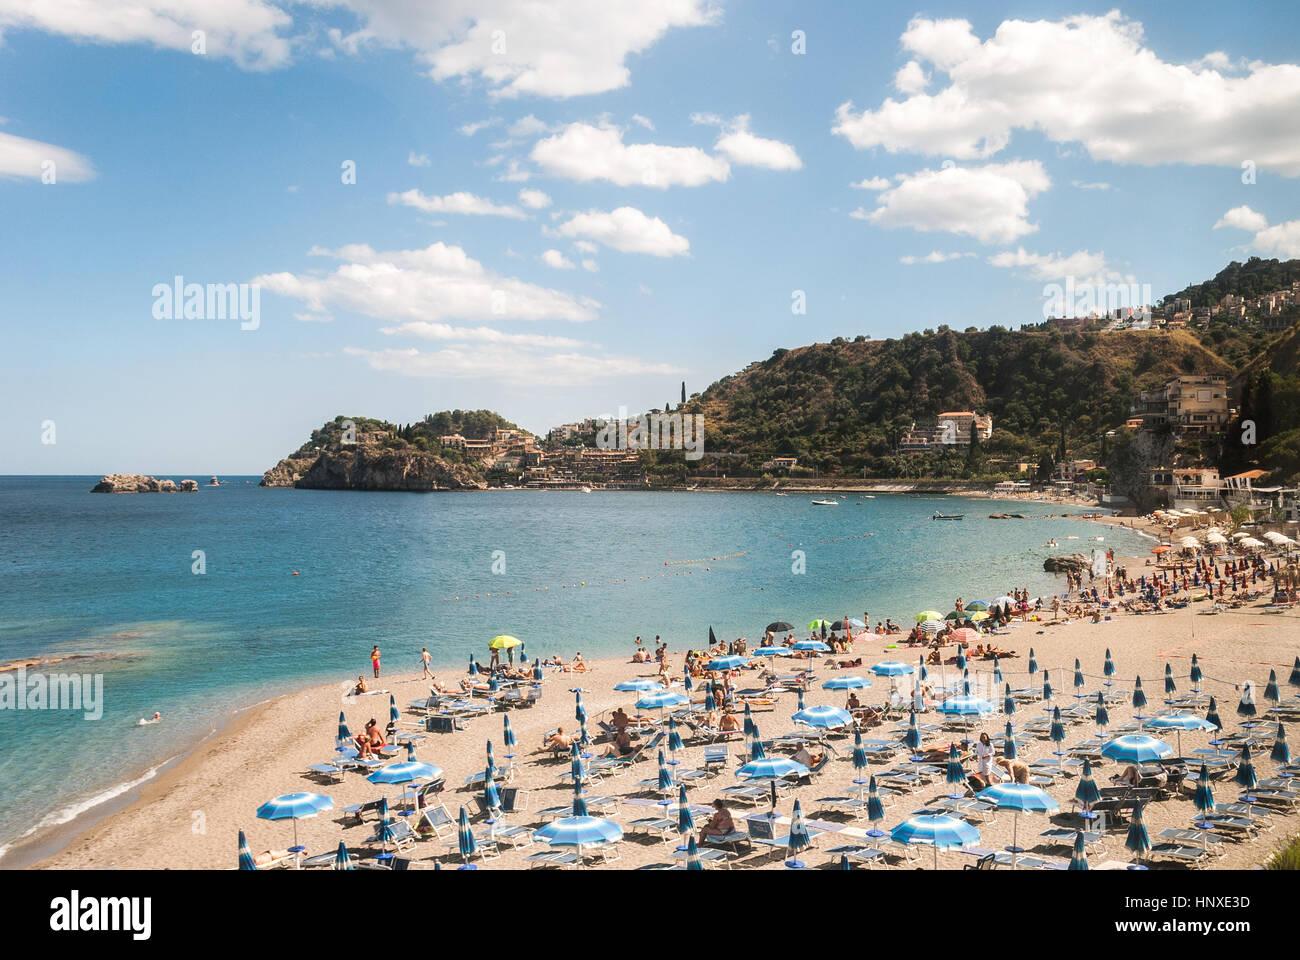 Beach near Taormina (Sicily) during the summer - Stock Image